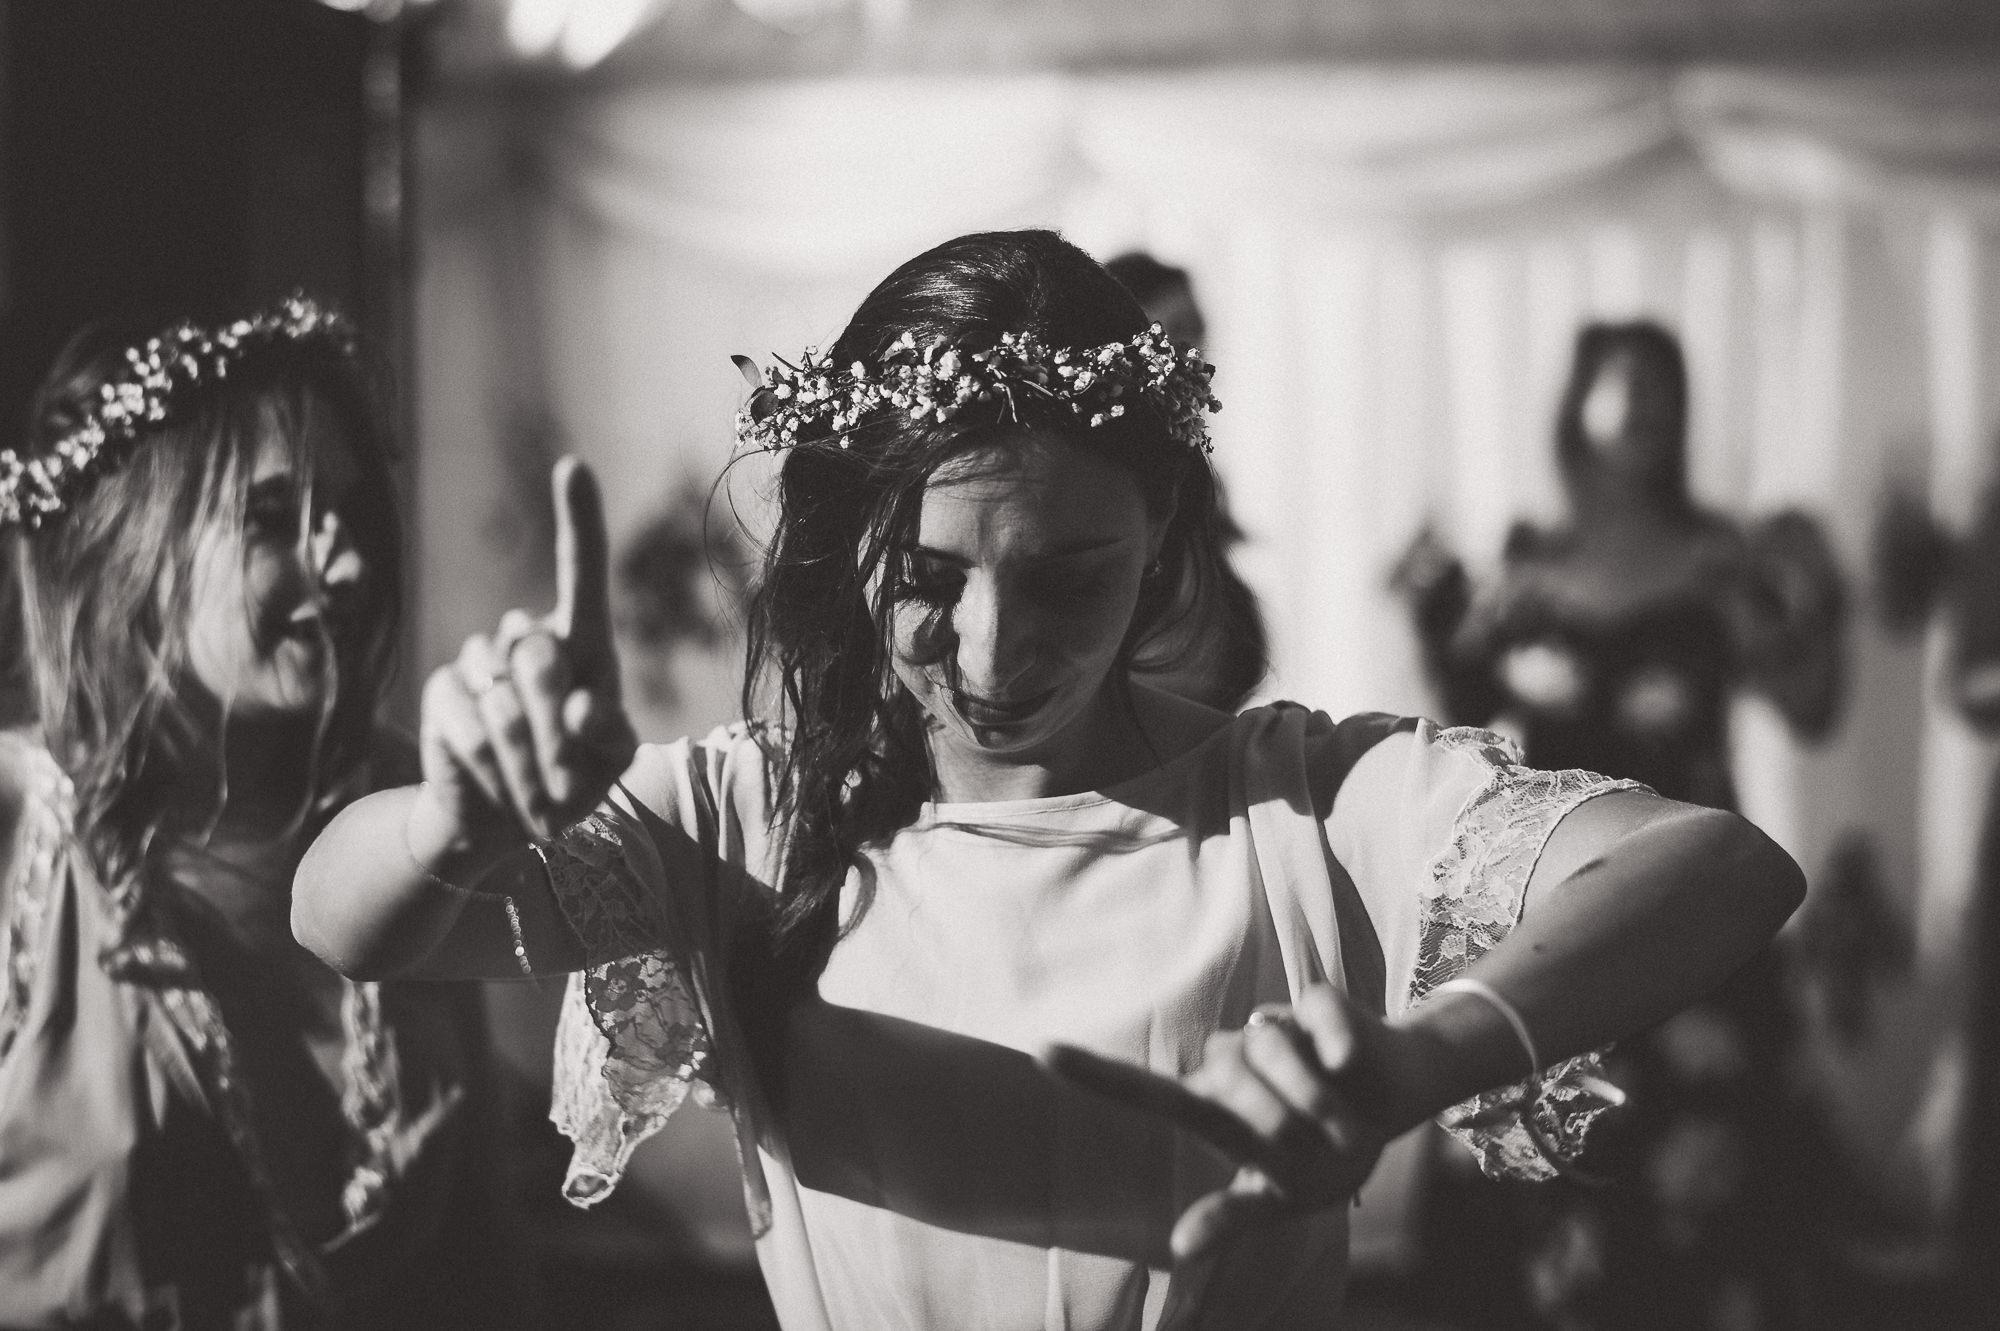 Veils & Bales Wedding Photography | Charlie & Steve SCSS 292